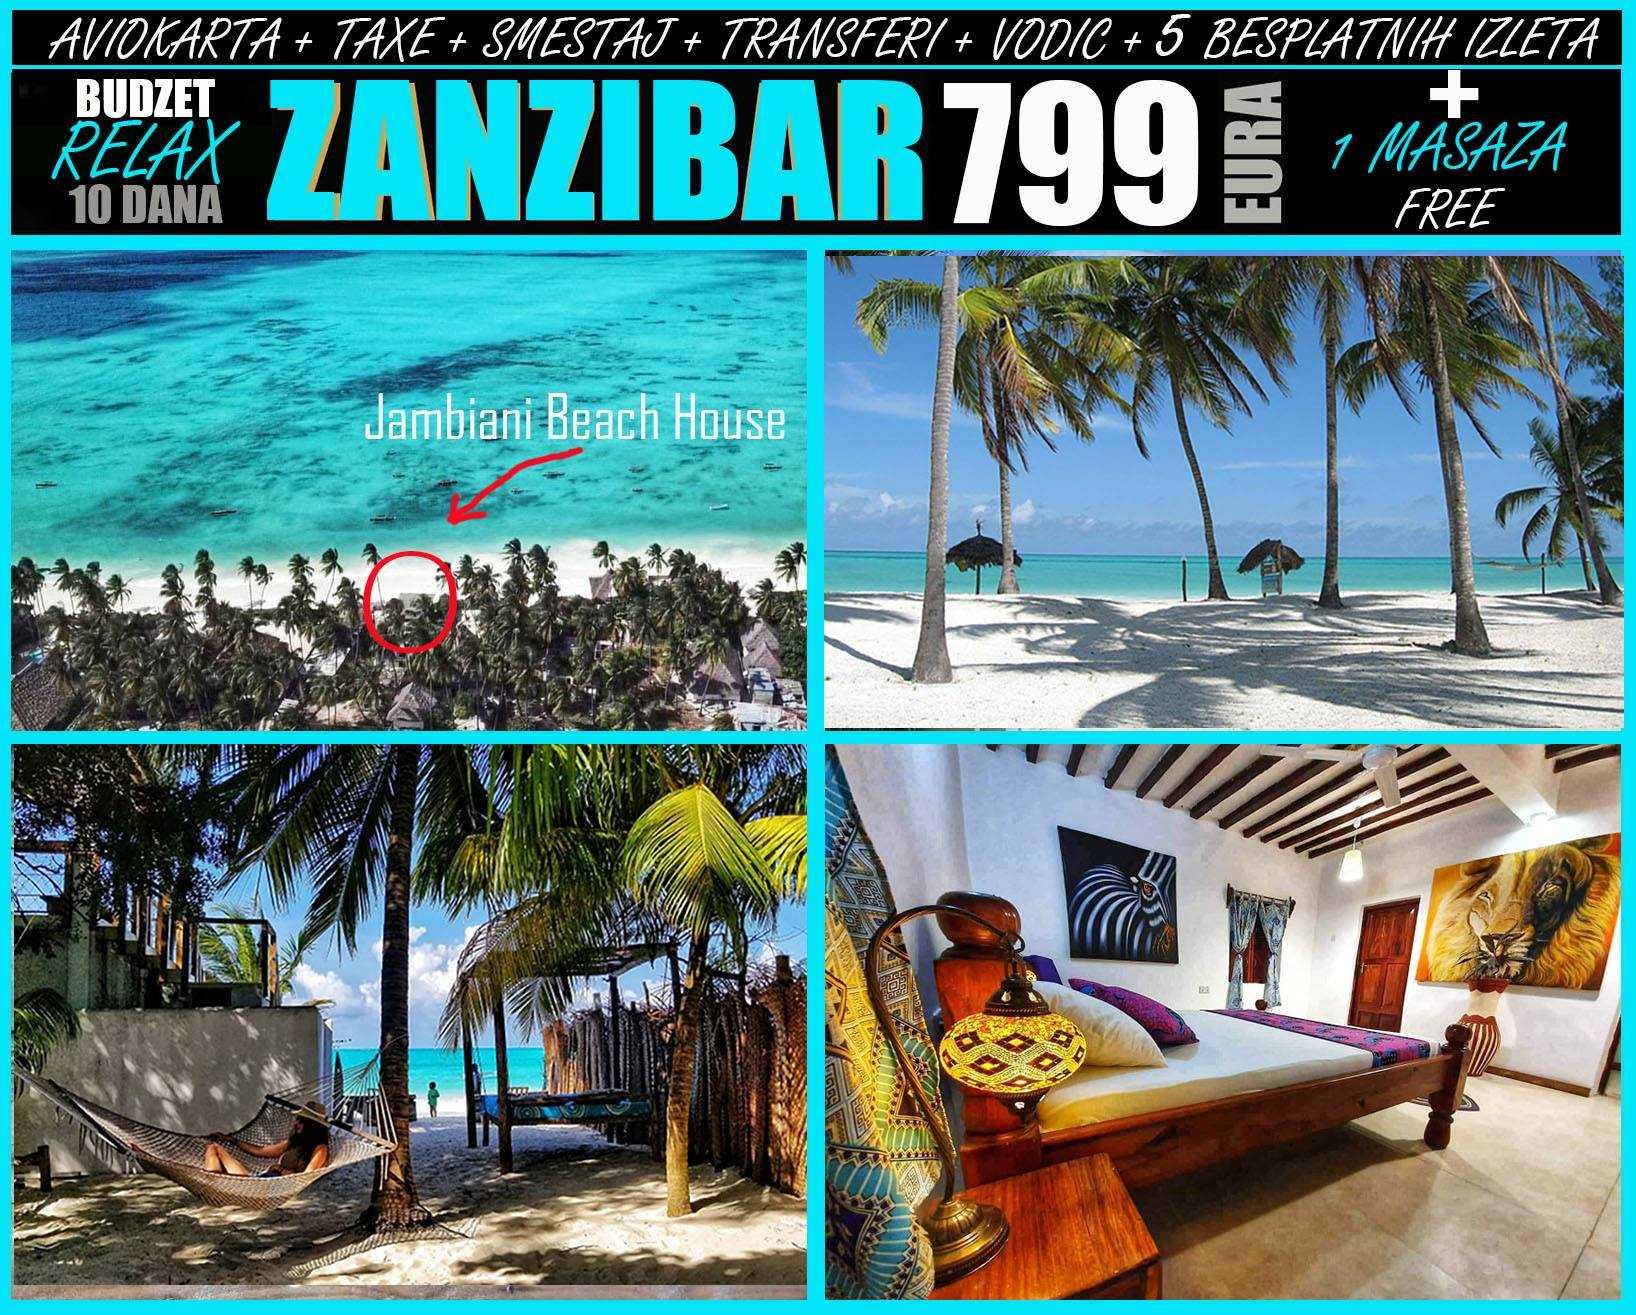 Zanzibar relax